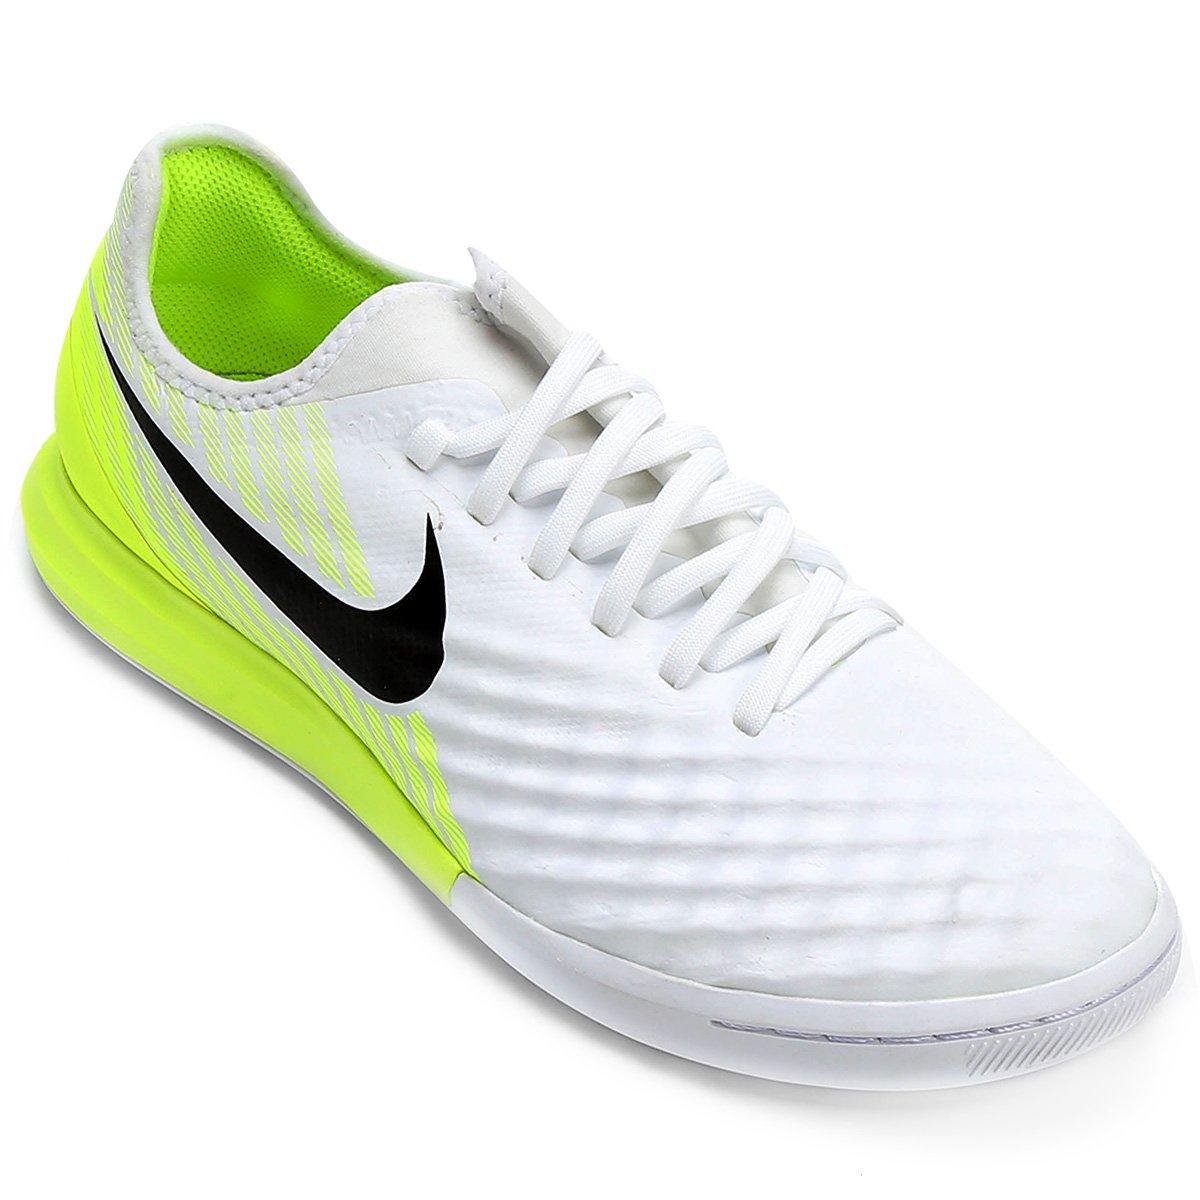 Comparación Arte pantalones  Chuteira Futsal Nike Magista Finale 2 IC | Netshoes